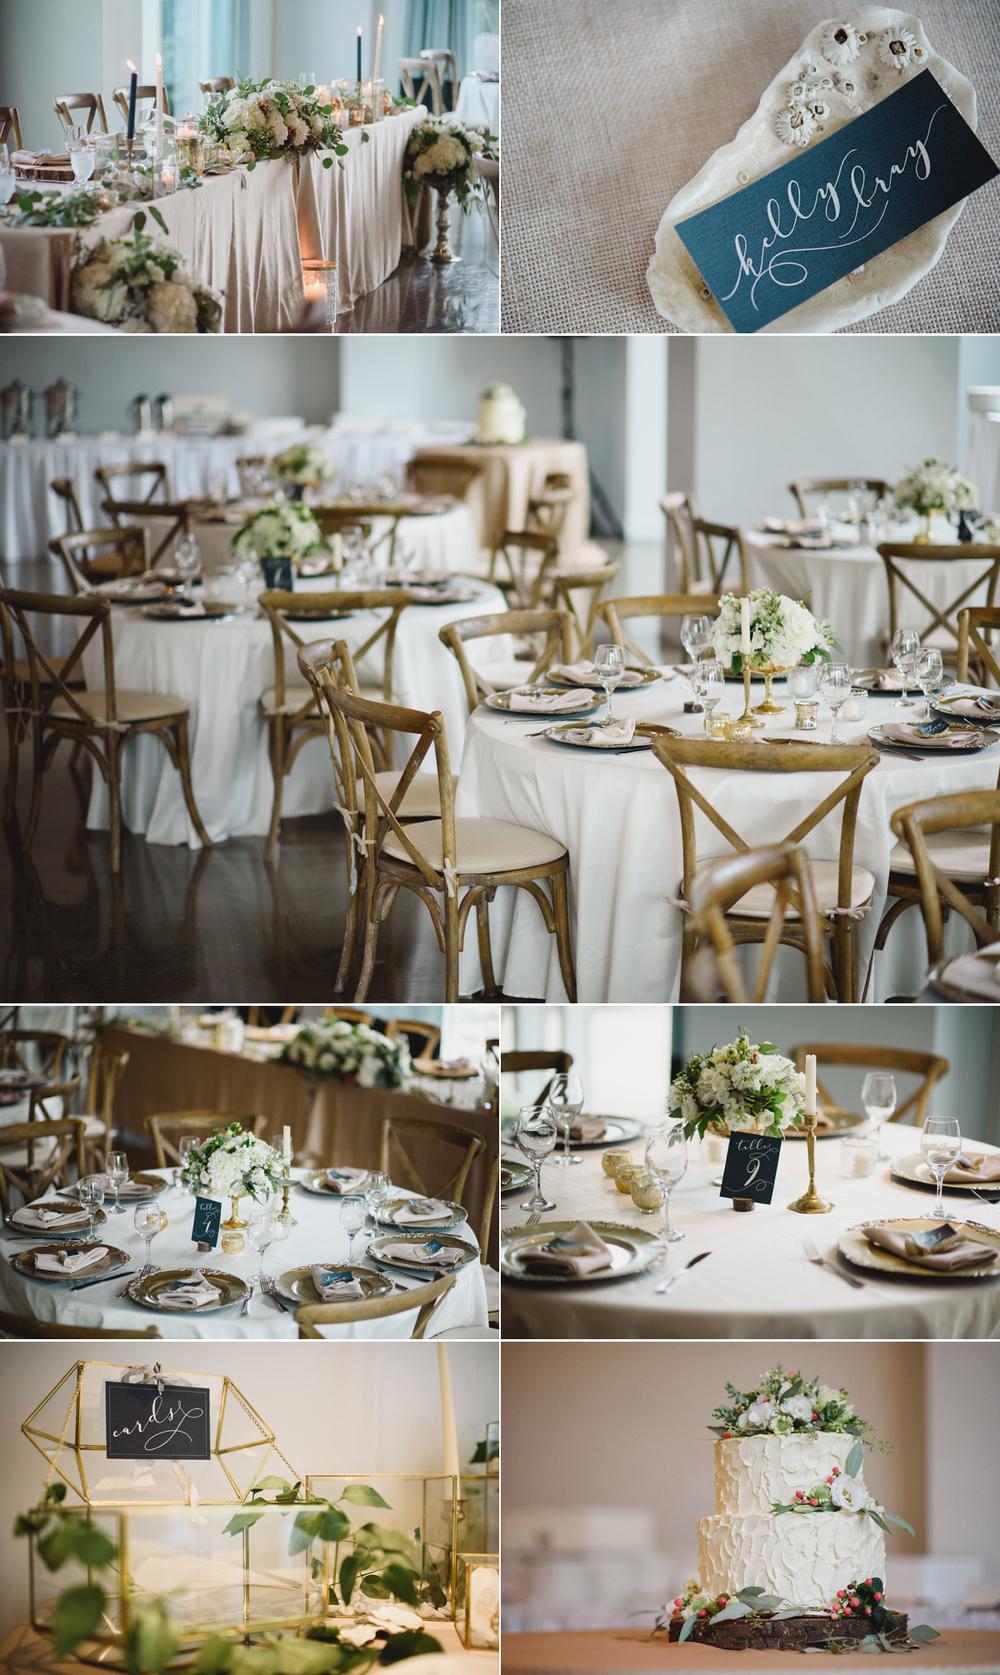 parkside hotel and spa wedding, coastal elegance, erin wallis photography